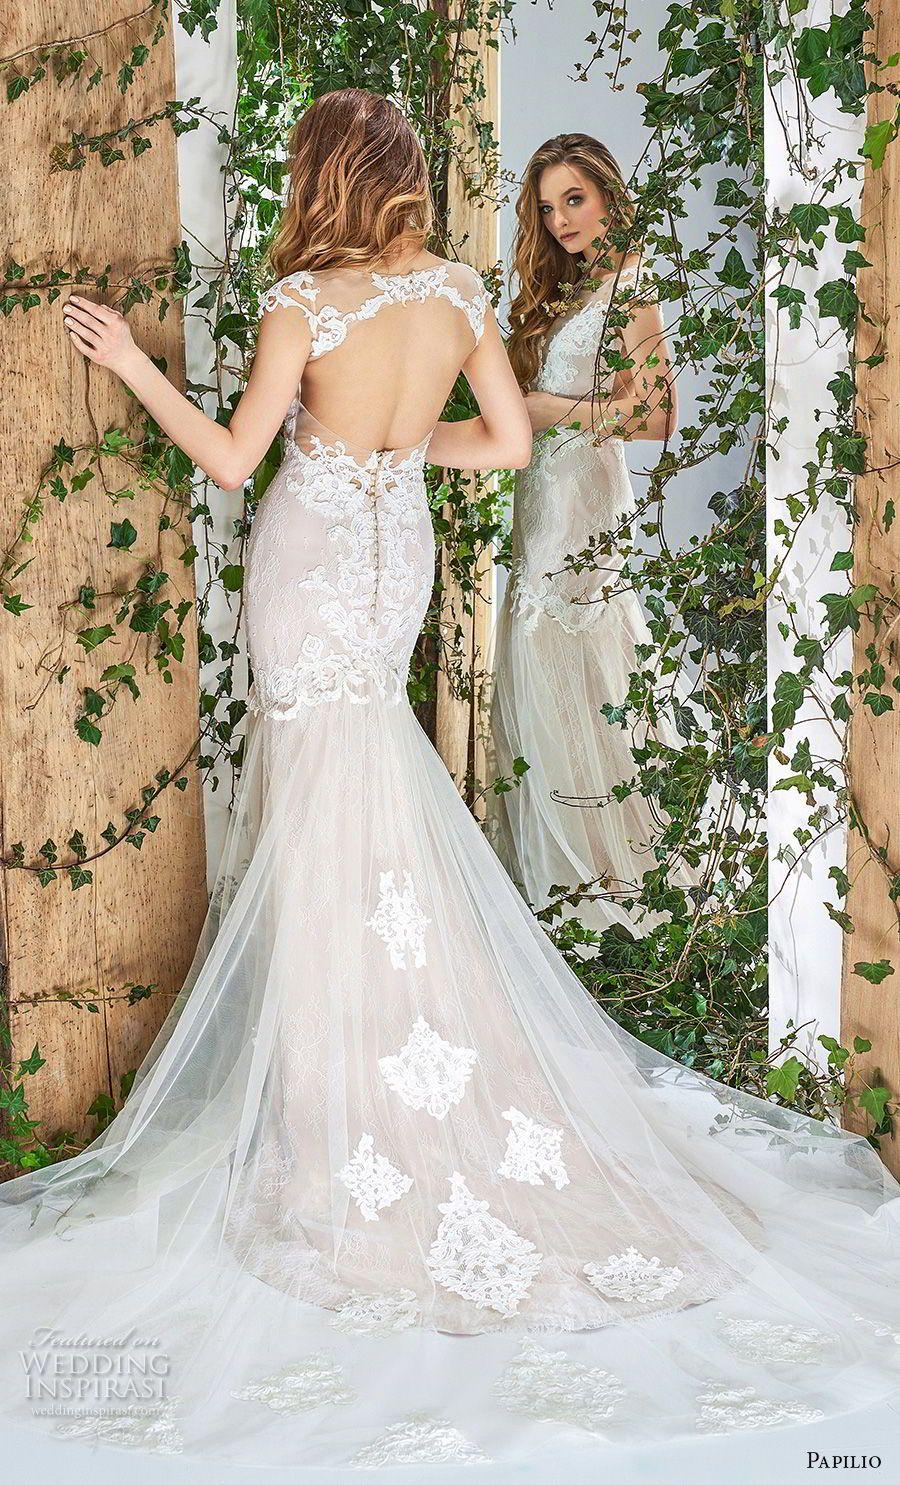 Elegant mermaid wedding dresses  Papilio  Wedding Dresses u ucWonderlandud Bridal Collection